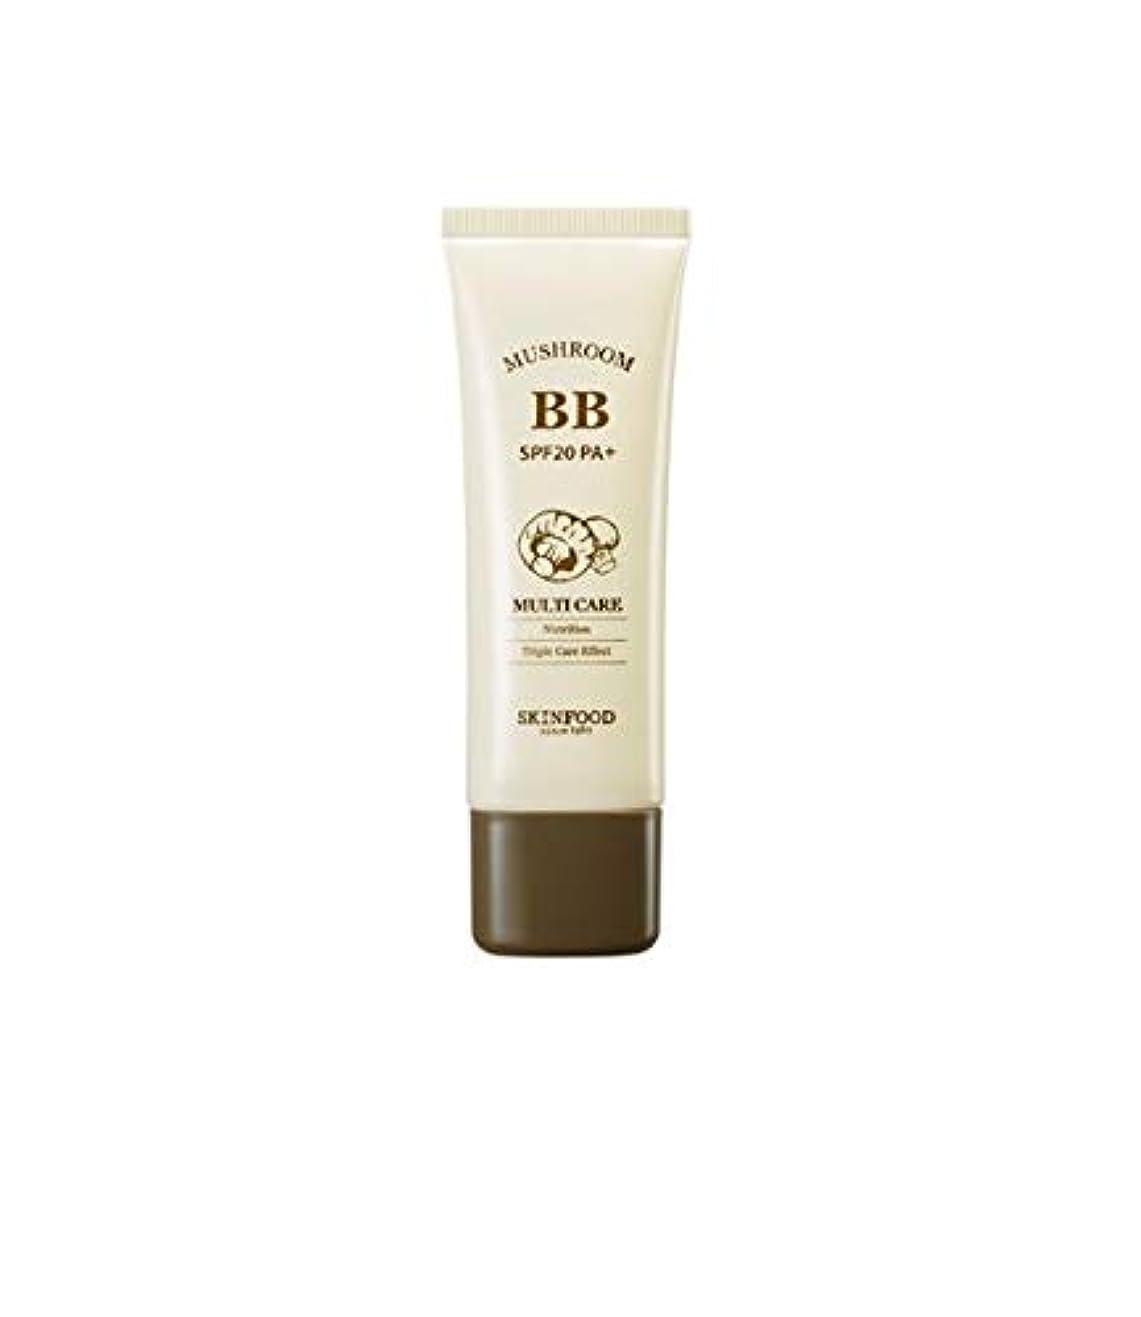 Skinfood マッシュルームマルチケアBBクリームSPF20 PA +#No. 1ブライトスキン / Mushroom Multi Care BB Cream SPF20 PA+# No. 1 Bright Skin 50g [並行輸入品]